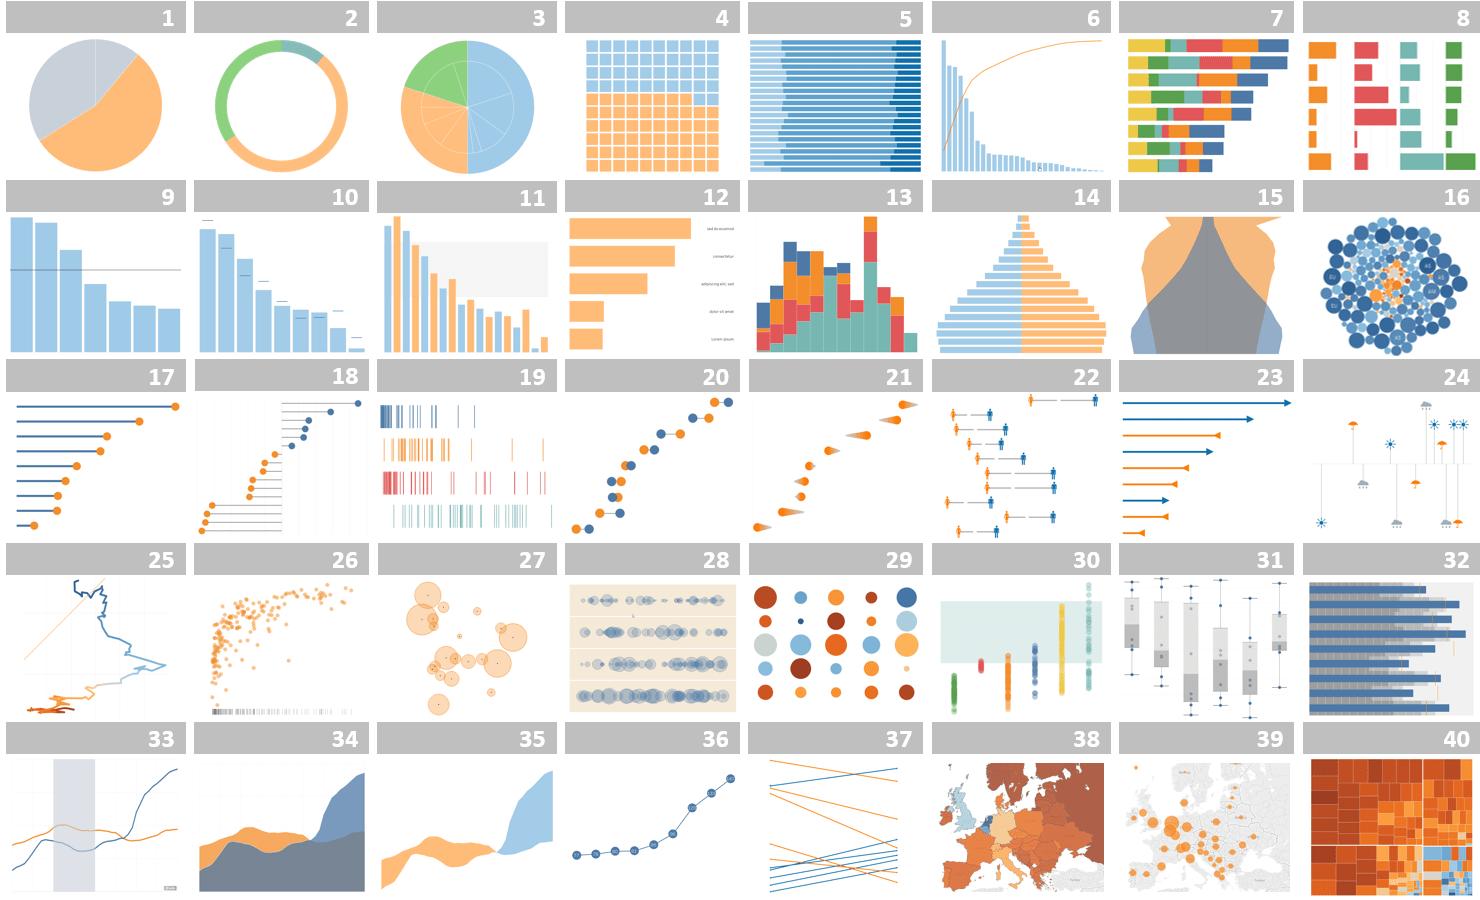 Tableau Your Data Ebook